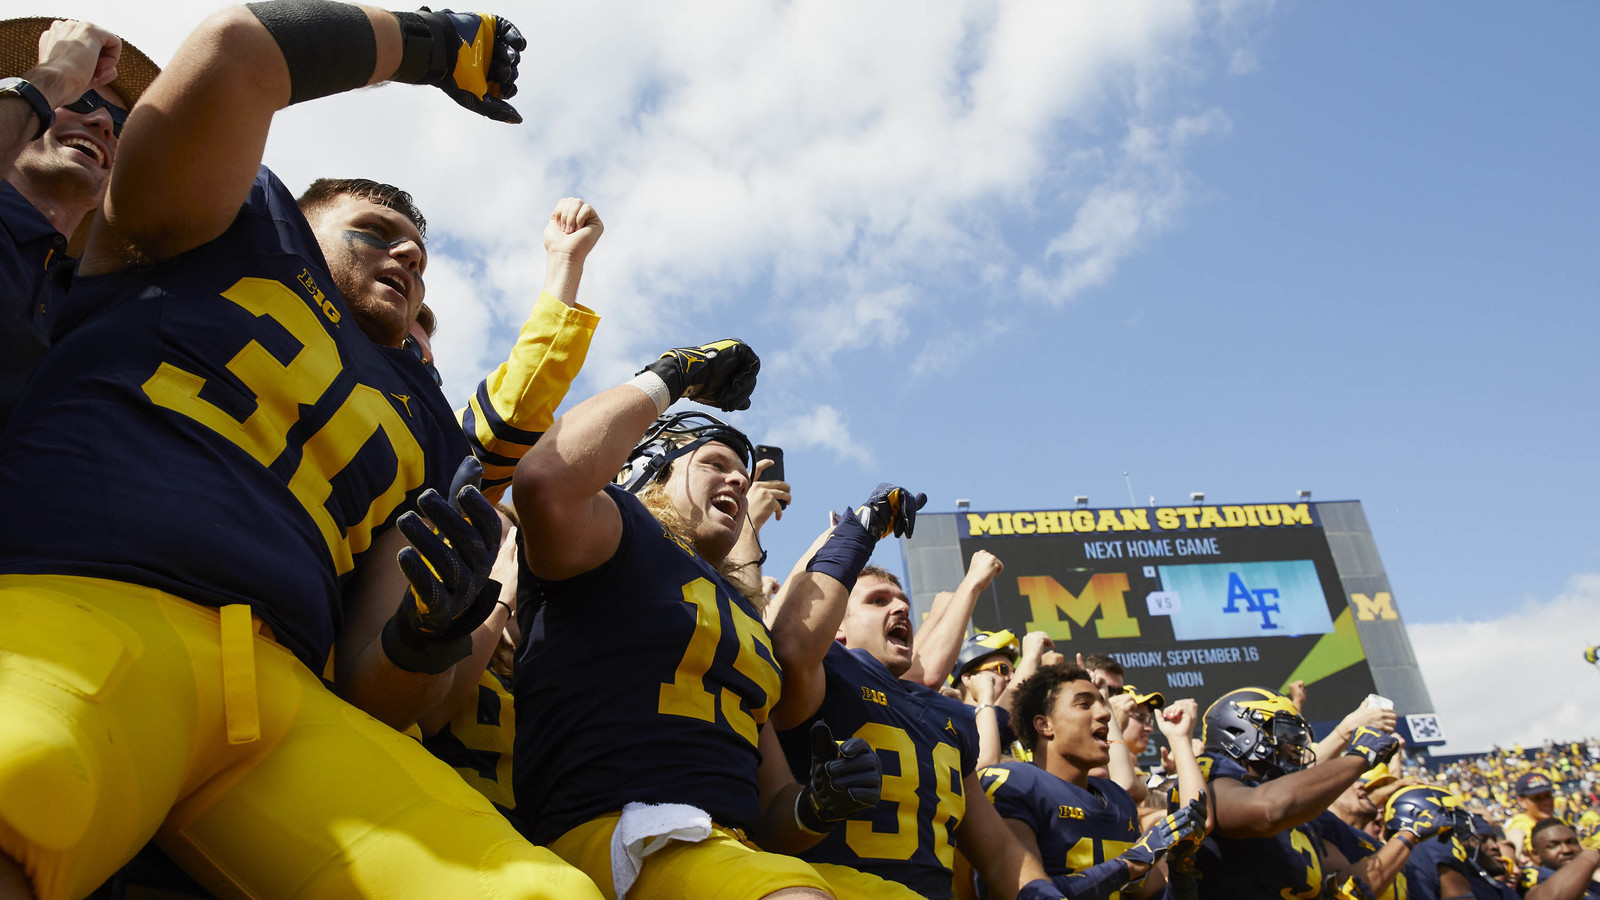 Sep 9, 2017; Ann Arbor, MI, USA; Michigan Wolverines players celebrate after defeating the Cincinnati Bearcats at Michigan Stadium. Rick Osentoski-USA TODAY ...